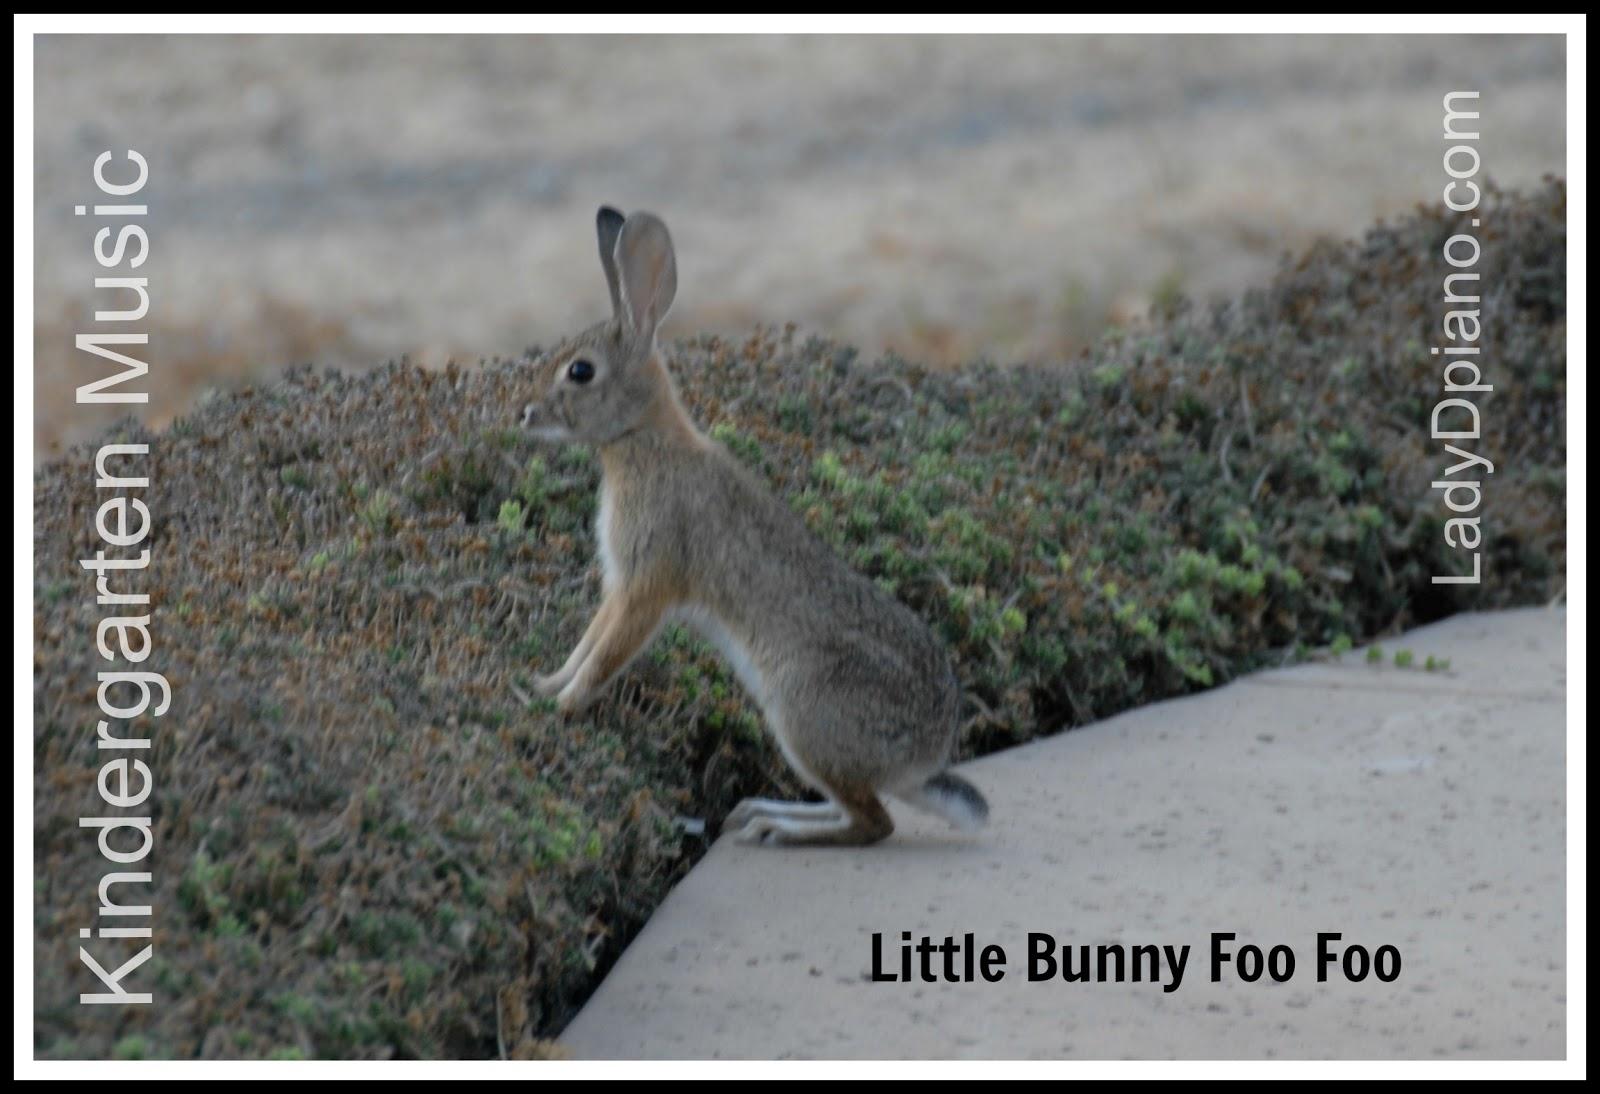 Kindergarten Music: Little Bunny Foo Foo